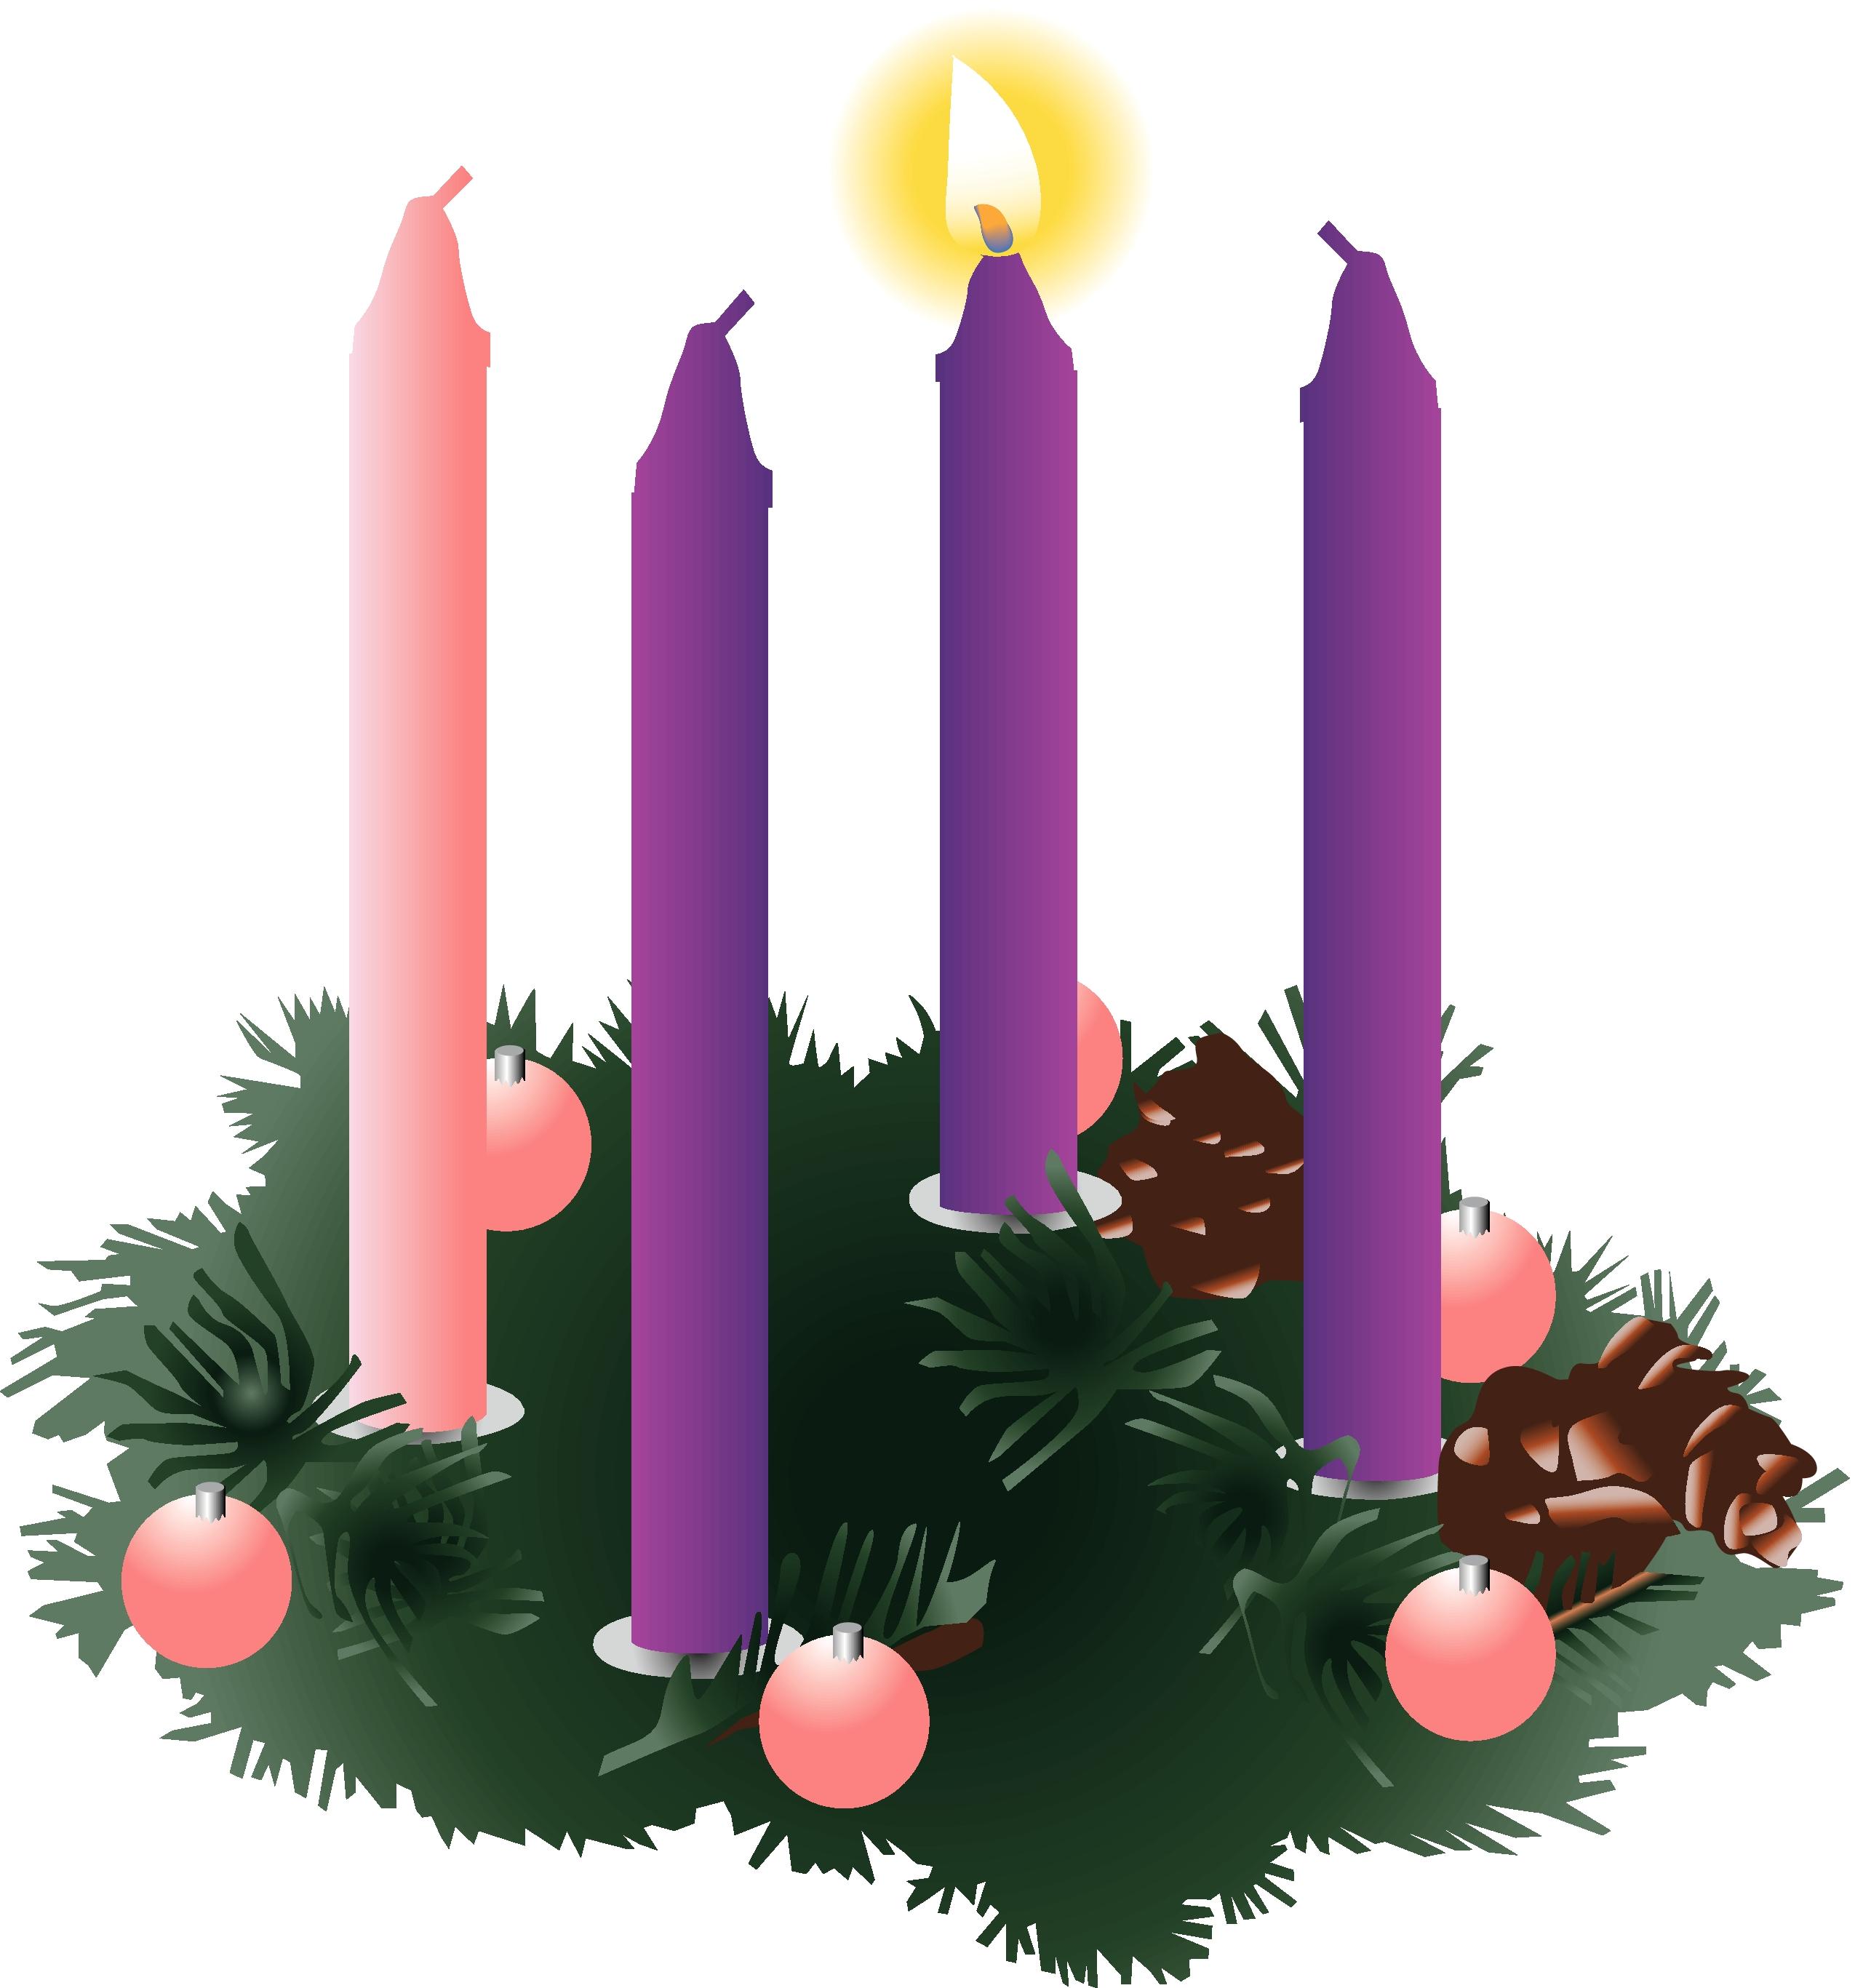 Sermon / November 30, 2014 / Lipton, SK / 1 Cor 1 / Pastor Terry Defoe / Enriched in Every Way